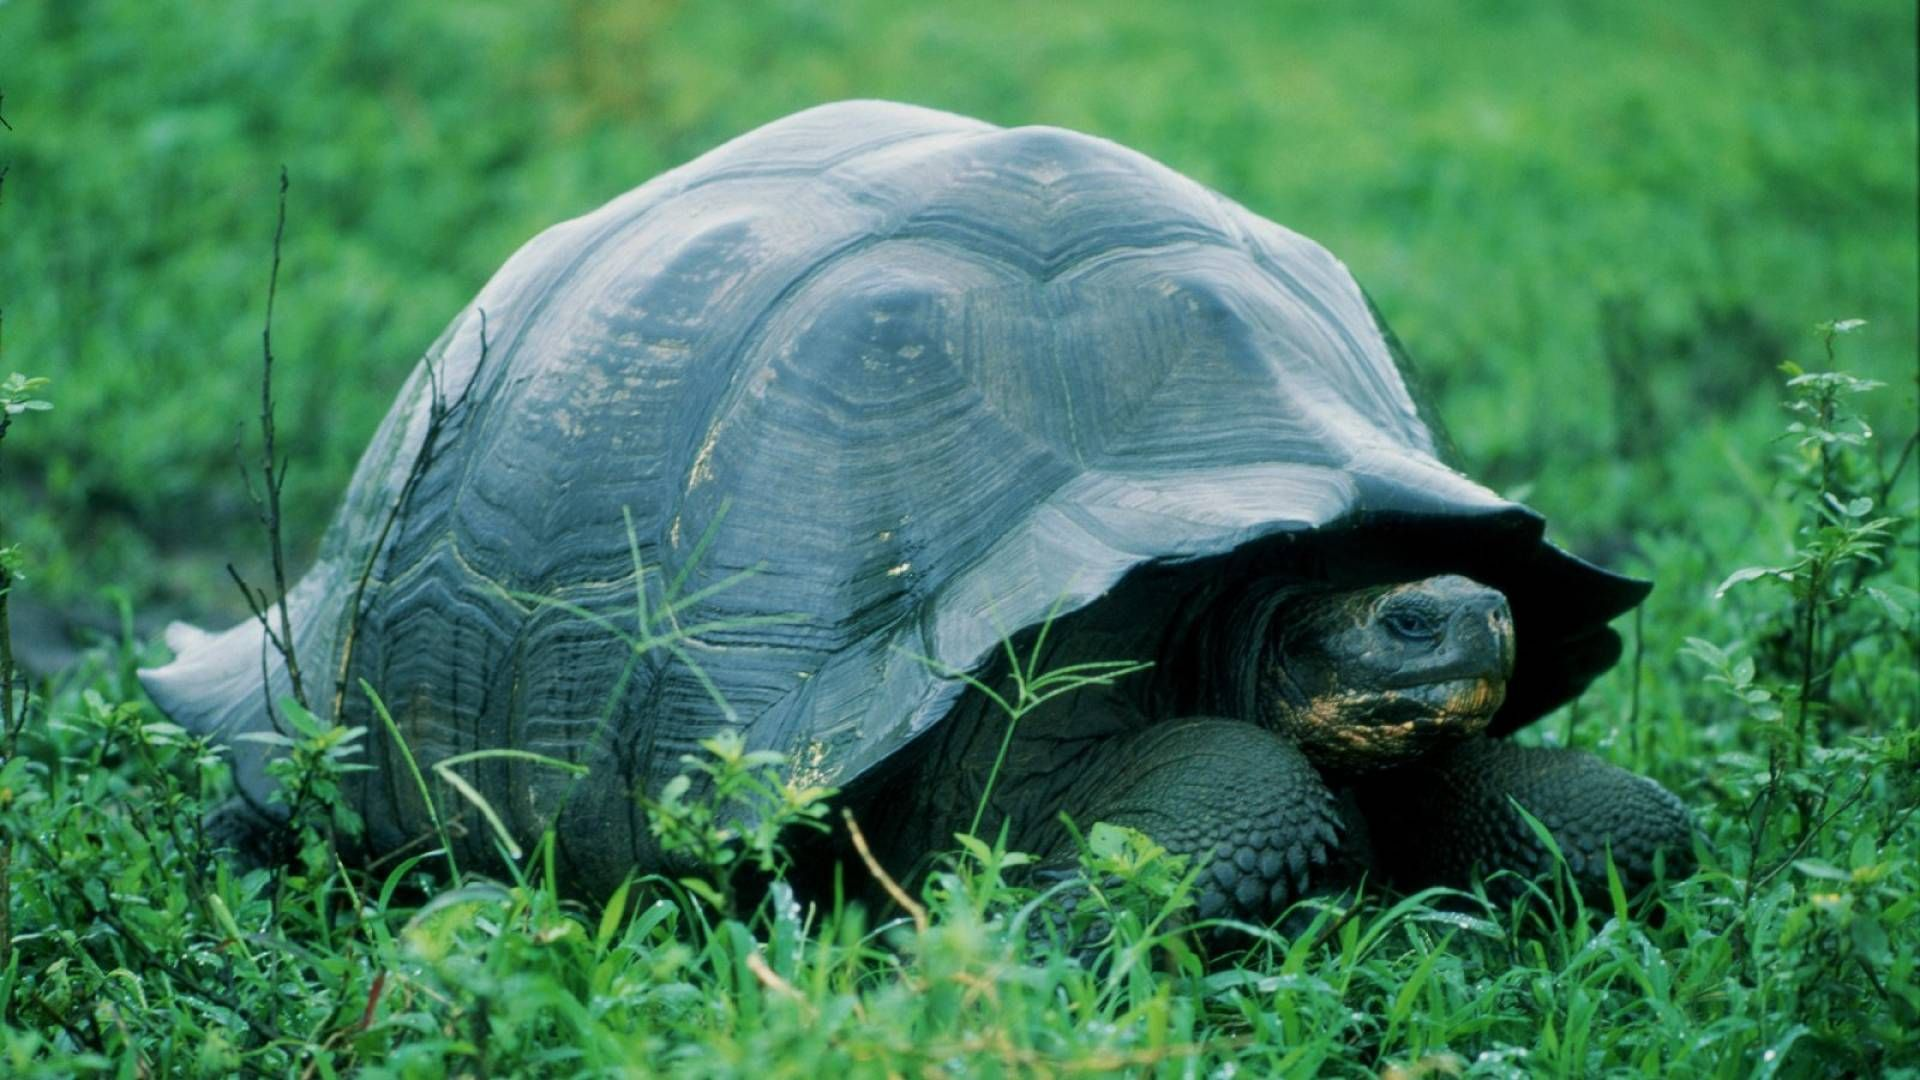 Skriesana Turtles